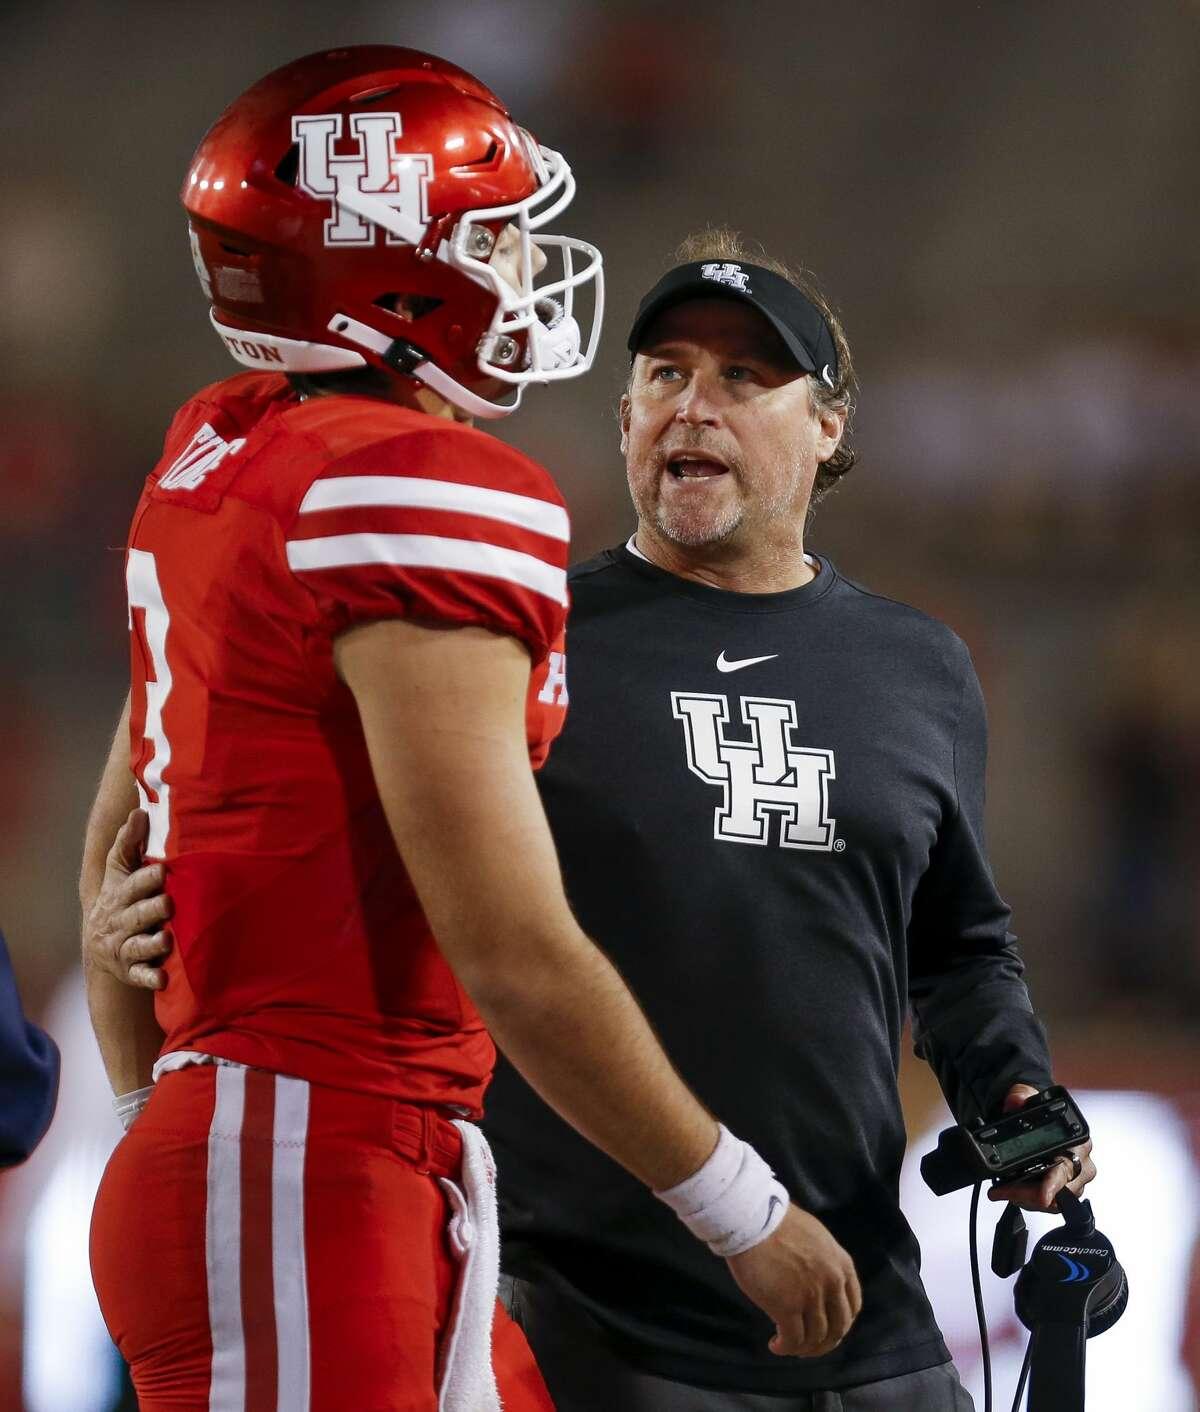 Houston Cougars head coach Dana Holgorsen talks to quarterback Clayton Tune (3) after an interception during the fourth quarter of an NCAA game against the Navy Midshipmen at TDECU Stadium Saturday, Nov. 30, 2019, in Houston. Navy won 56-41.